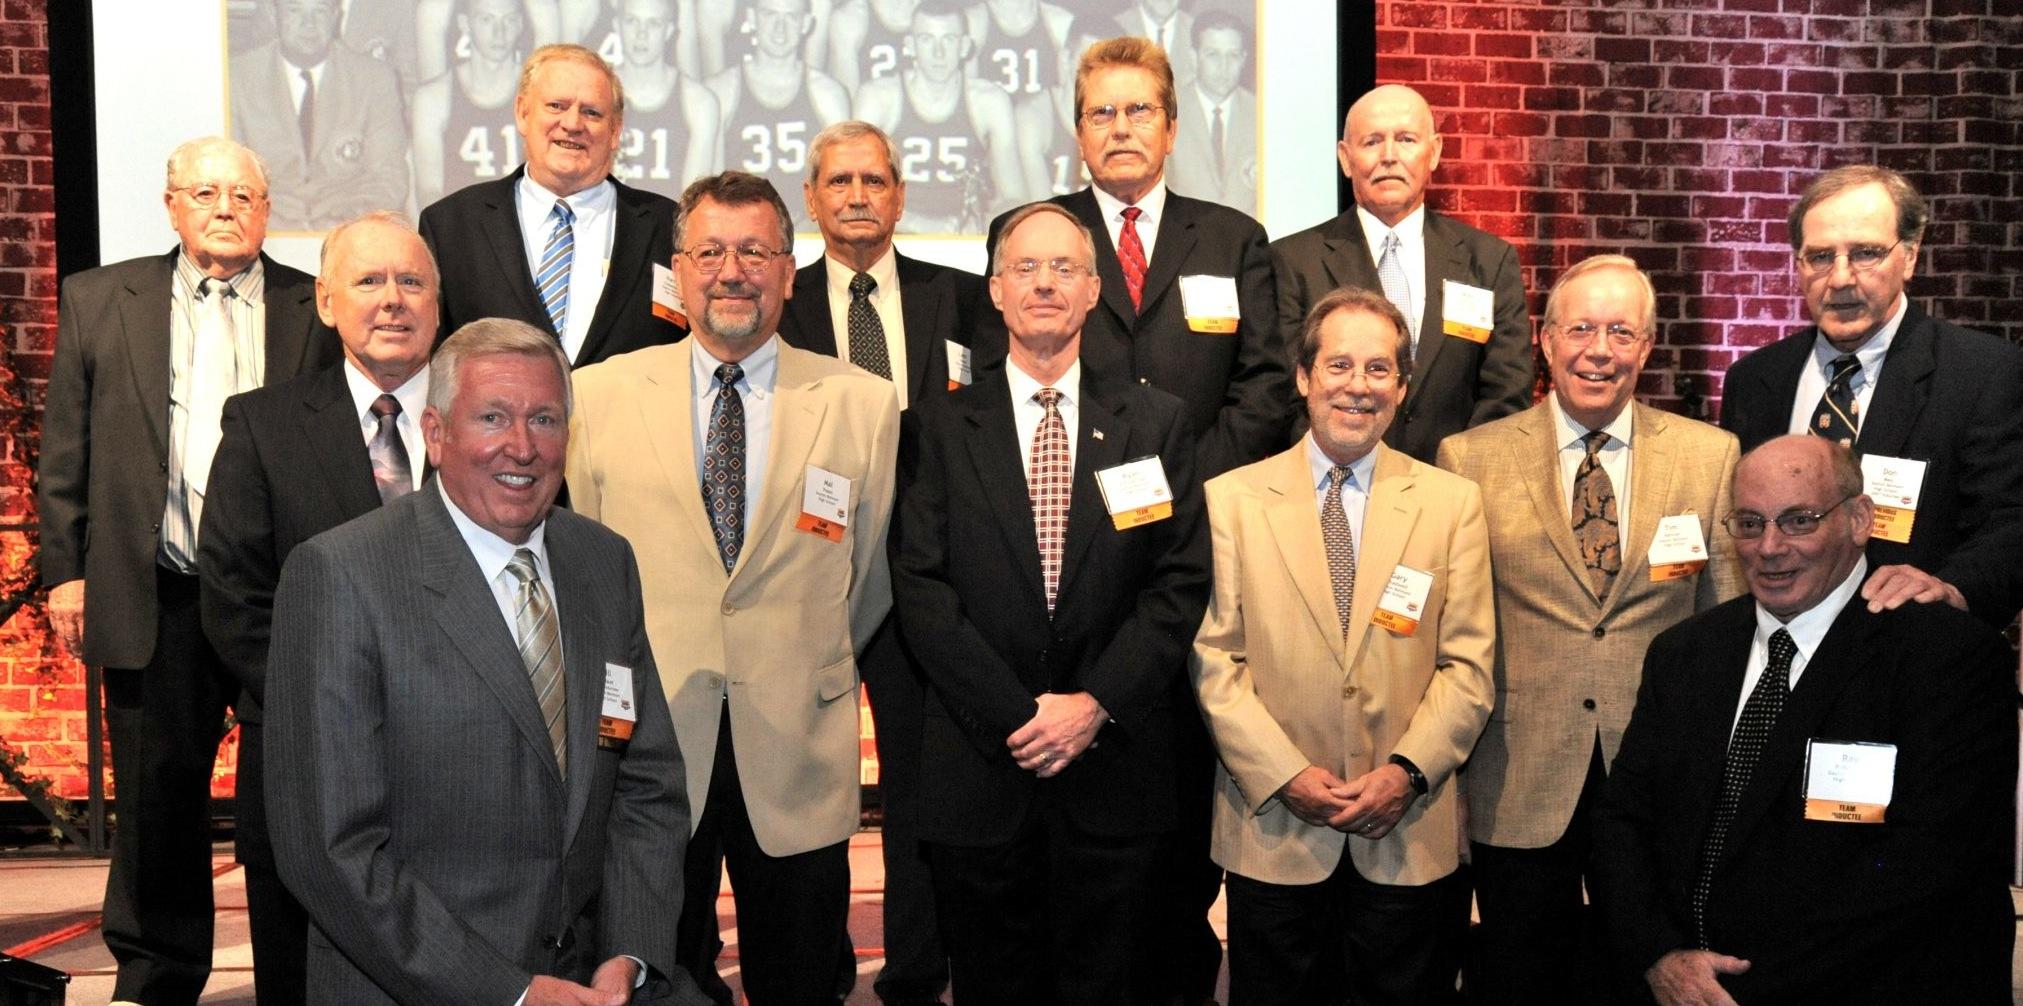 Ohio Basketball Hall Of Fame Hall Of Fame Inductees